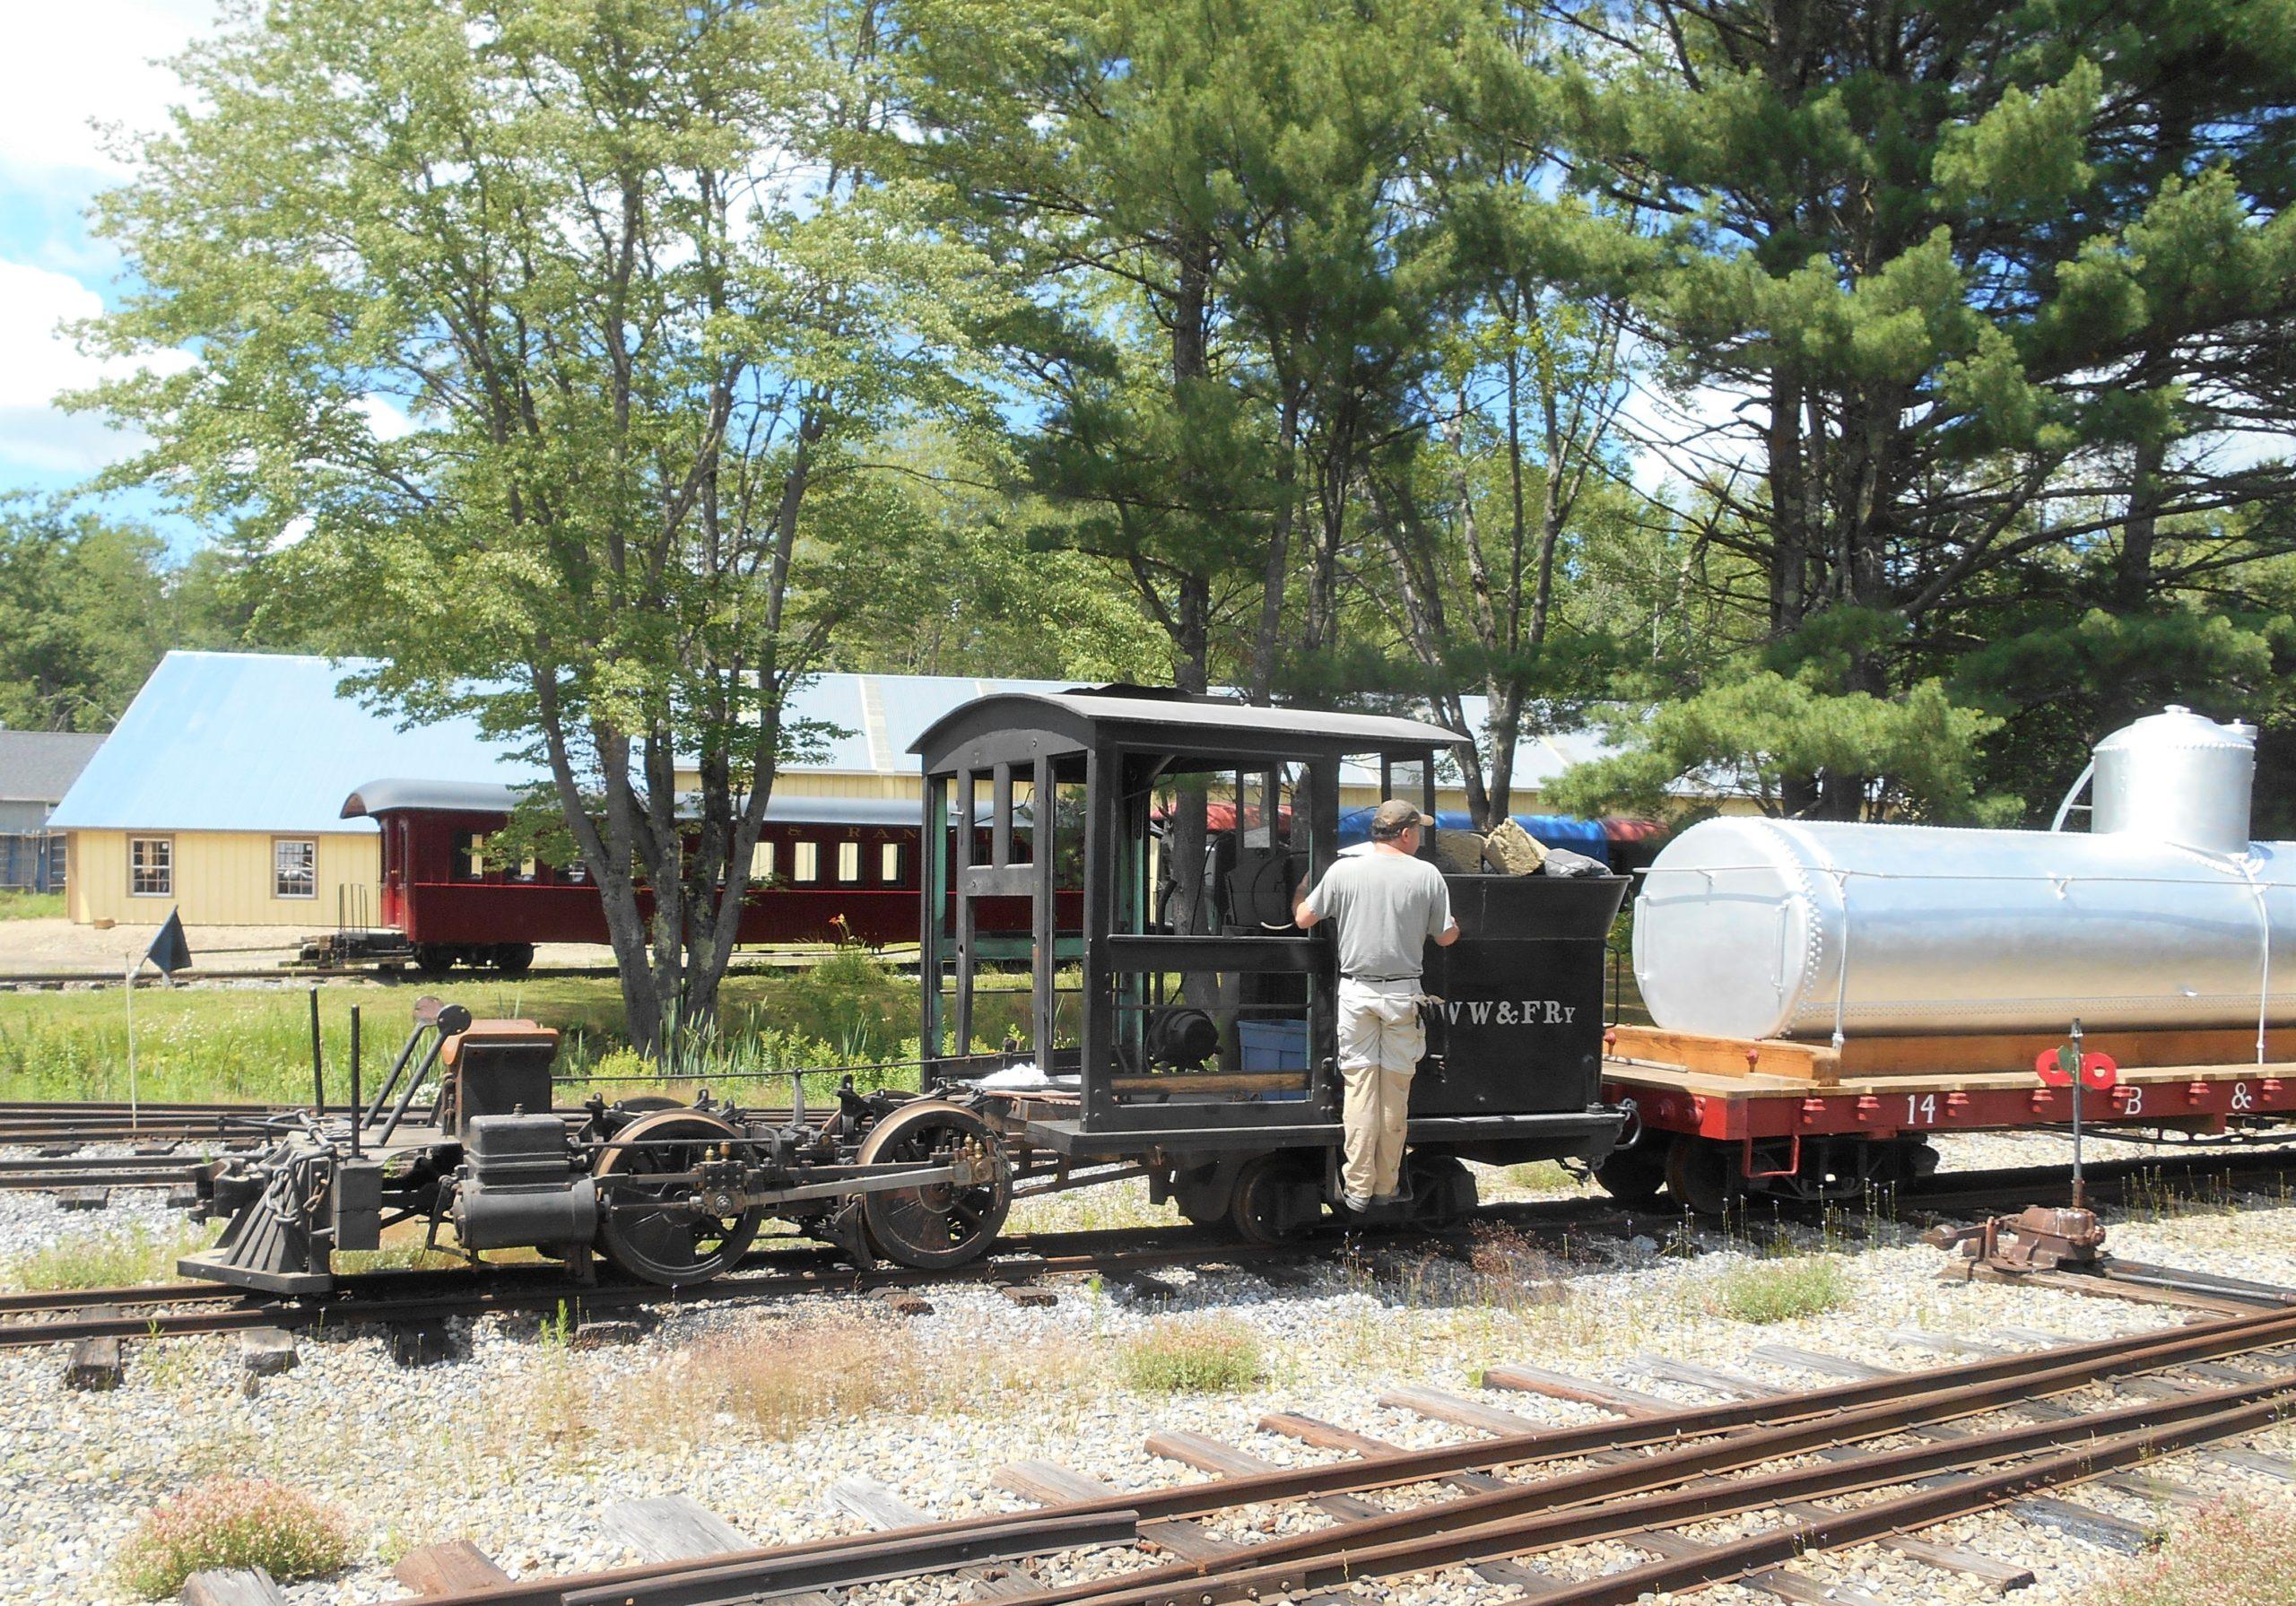 Locomotive 10 on the move